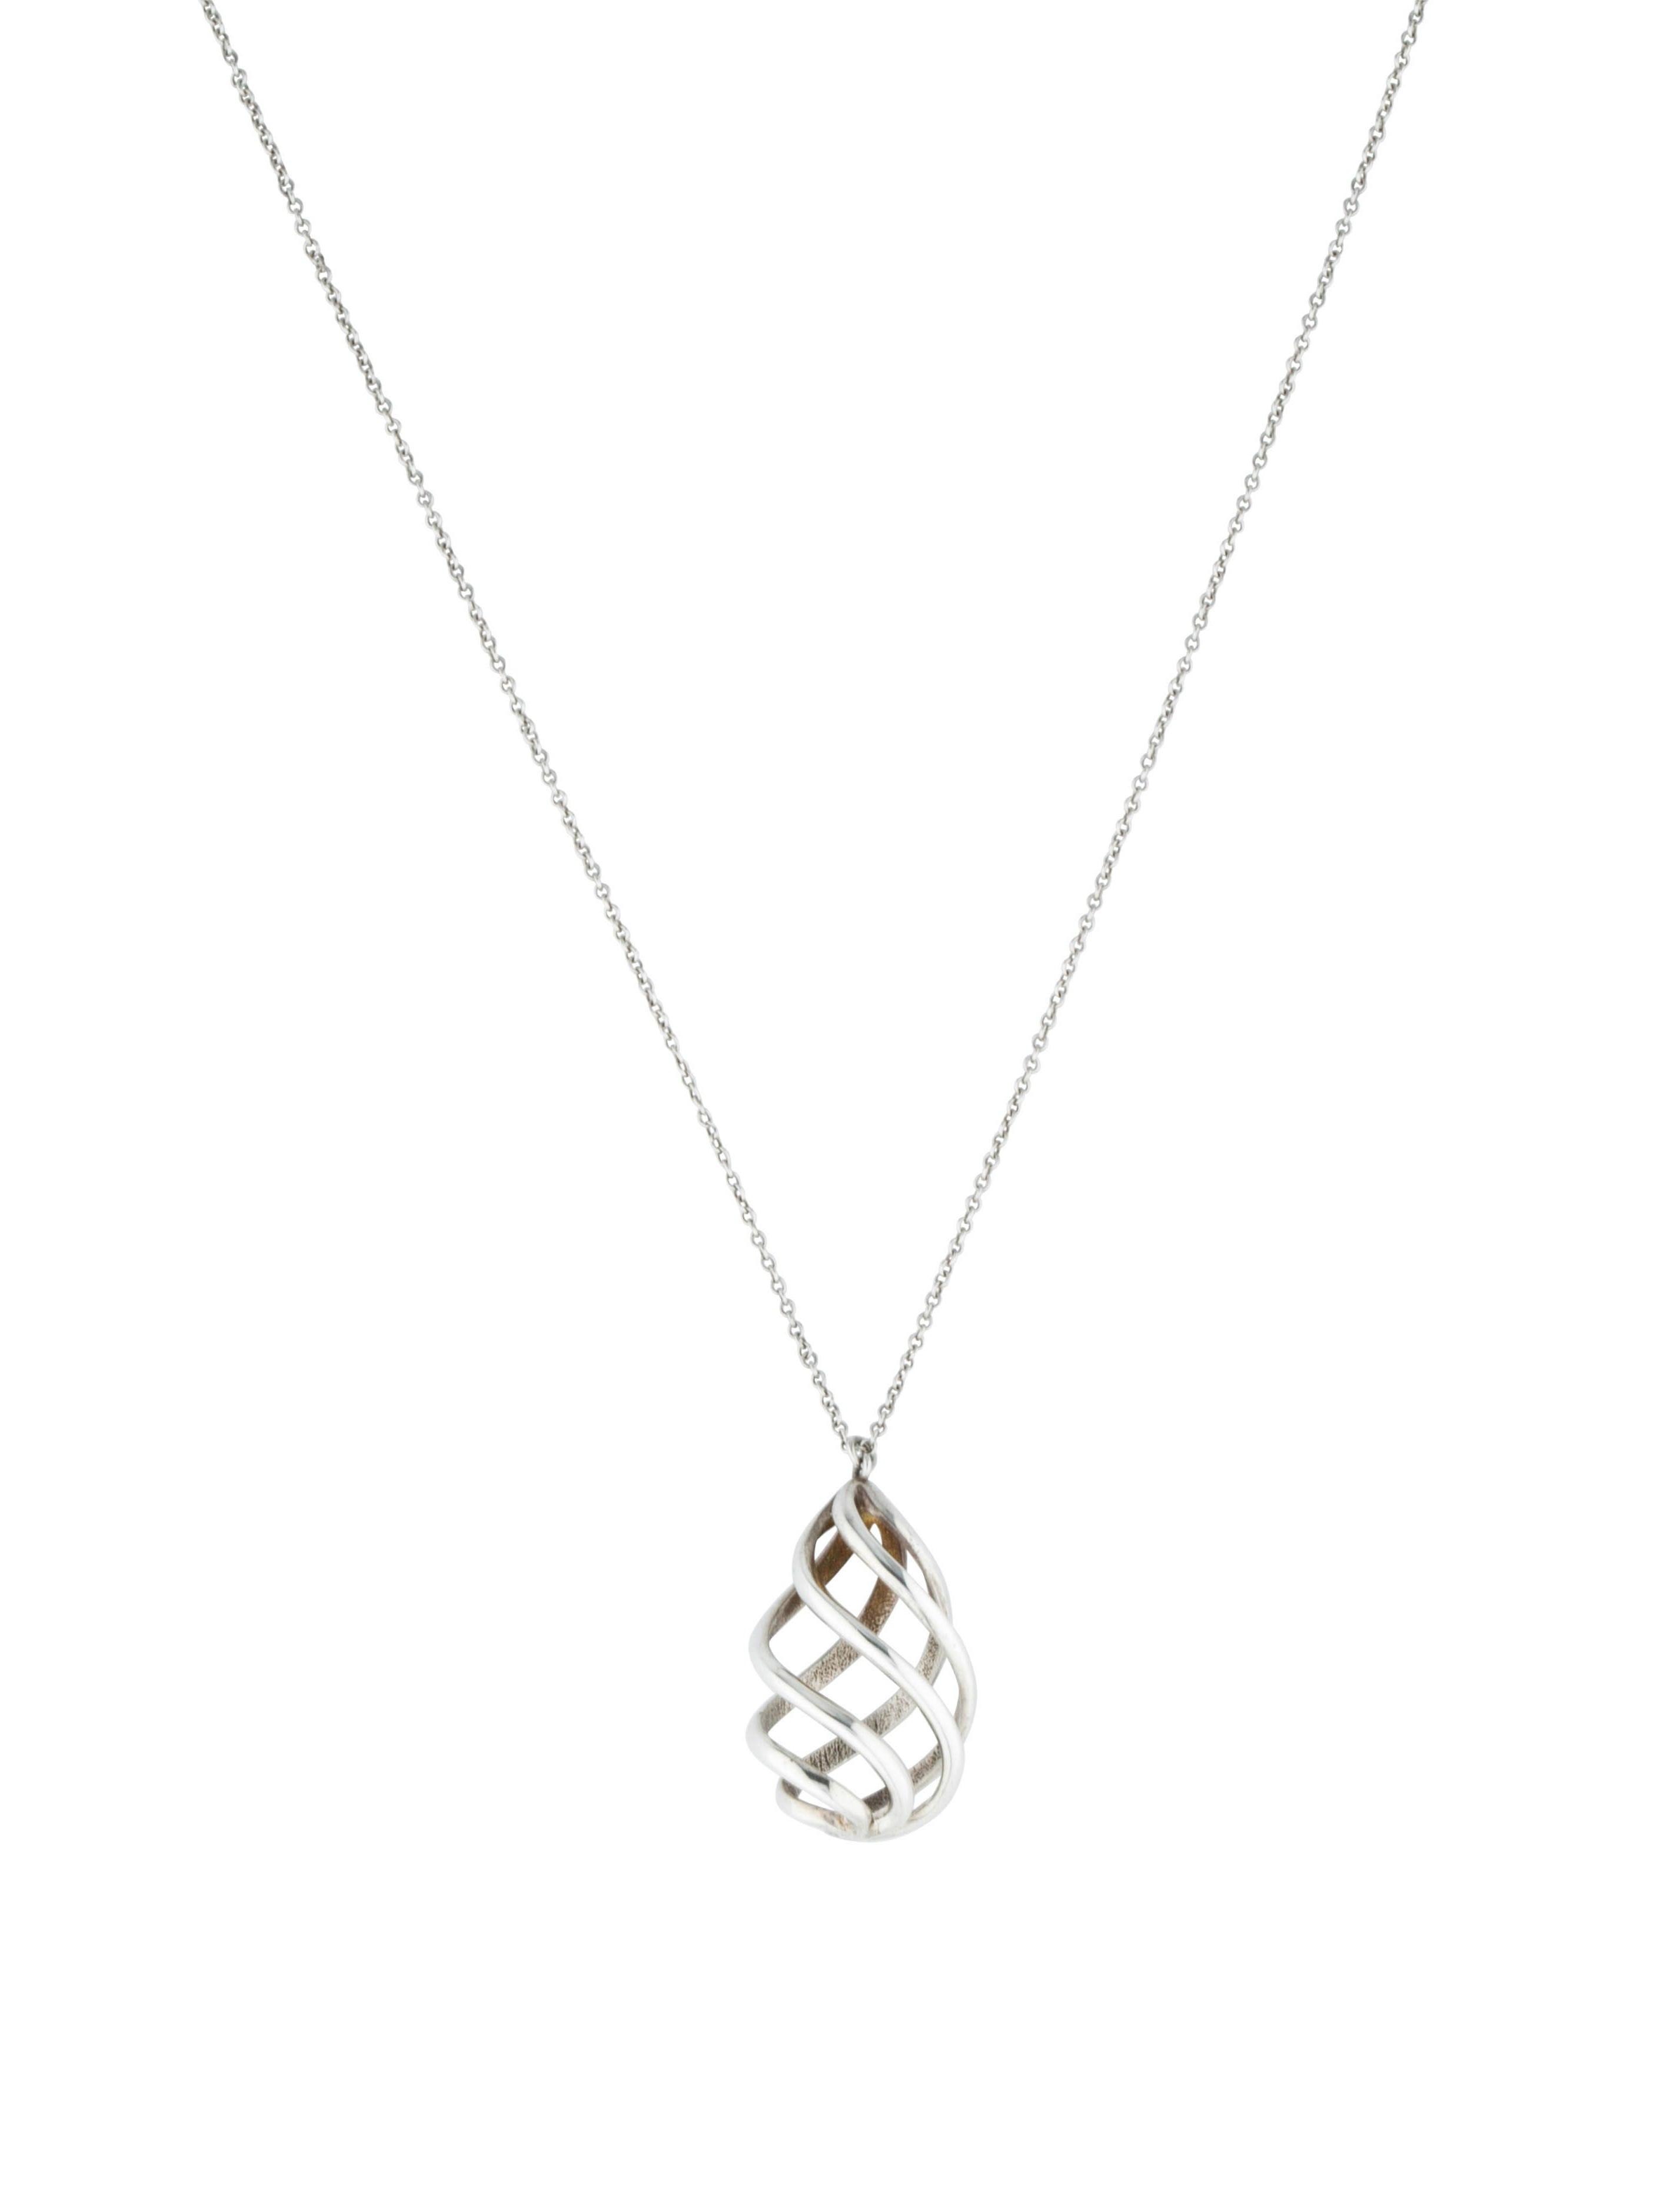 f1b671616 Tiffany & Co. Venezia Luce Necklace - Necklaces - TIF28863 | The ...